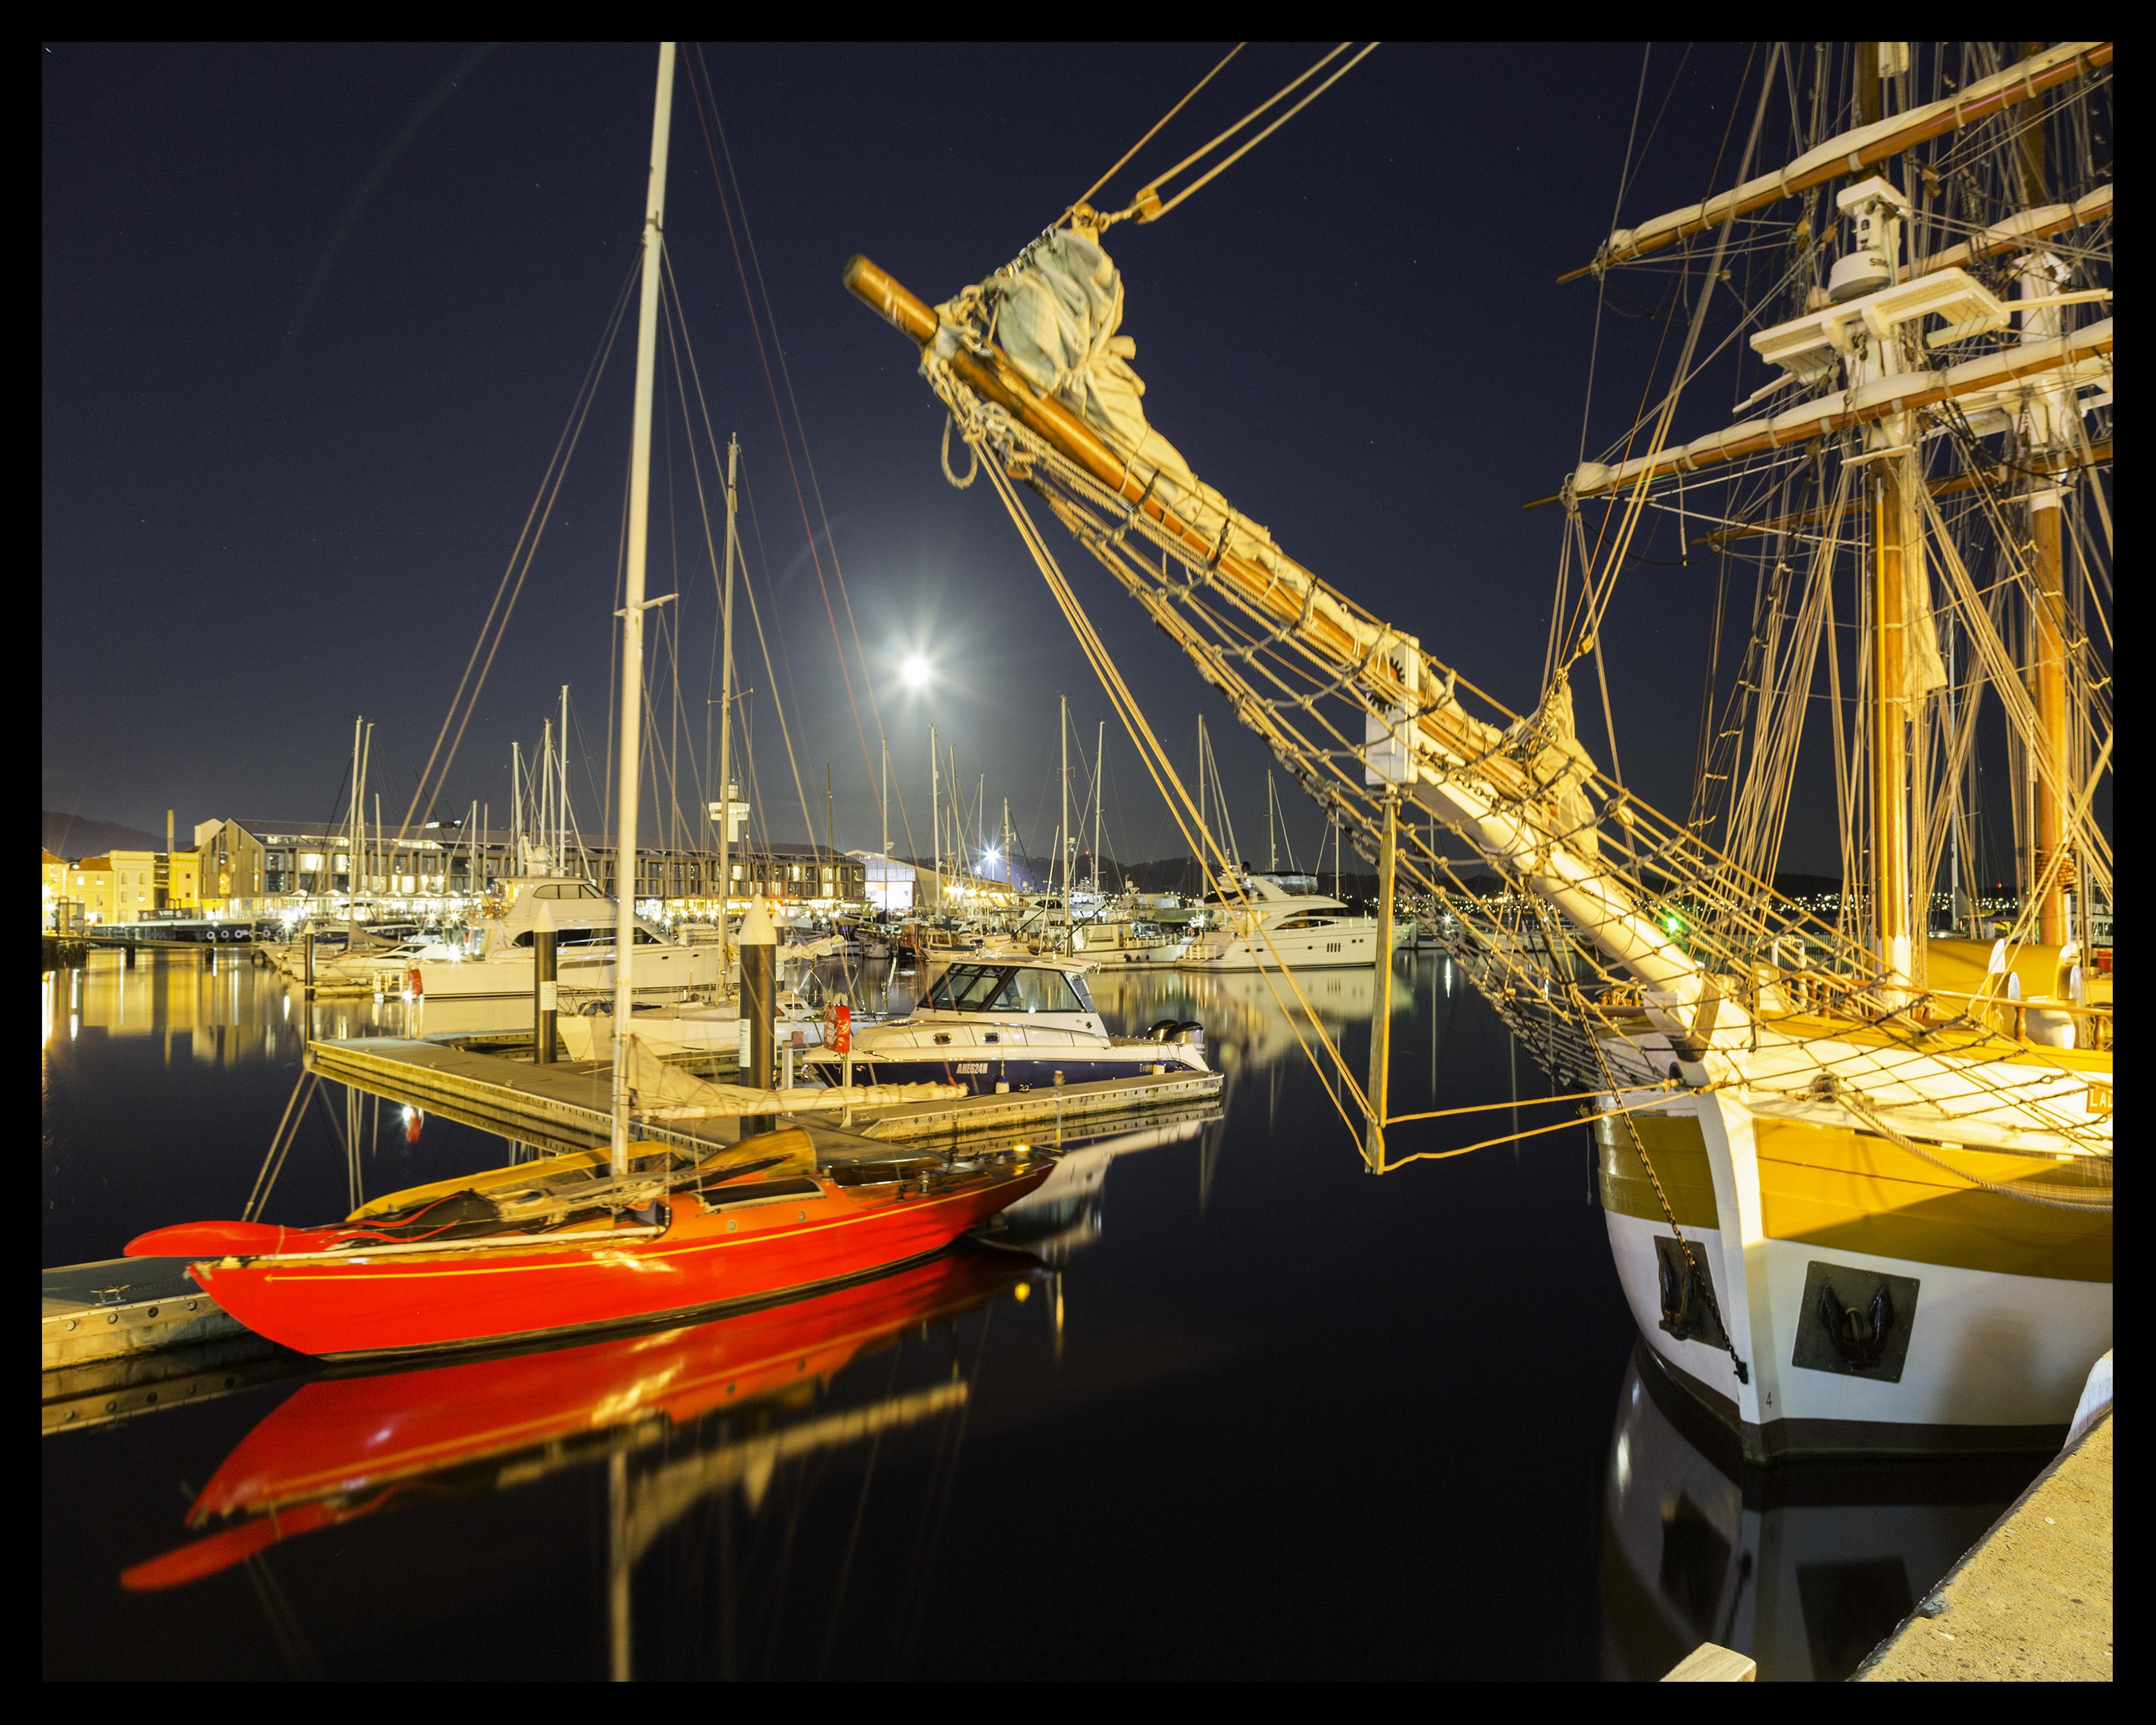 Tassi Boats